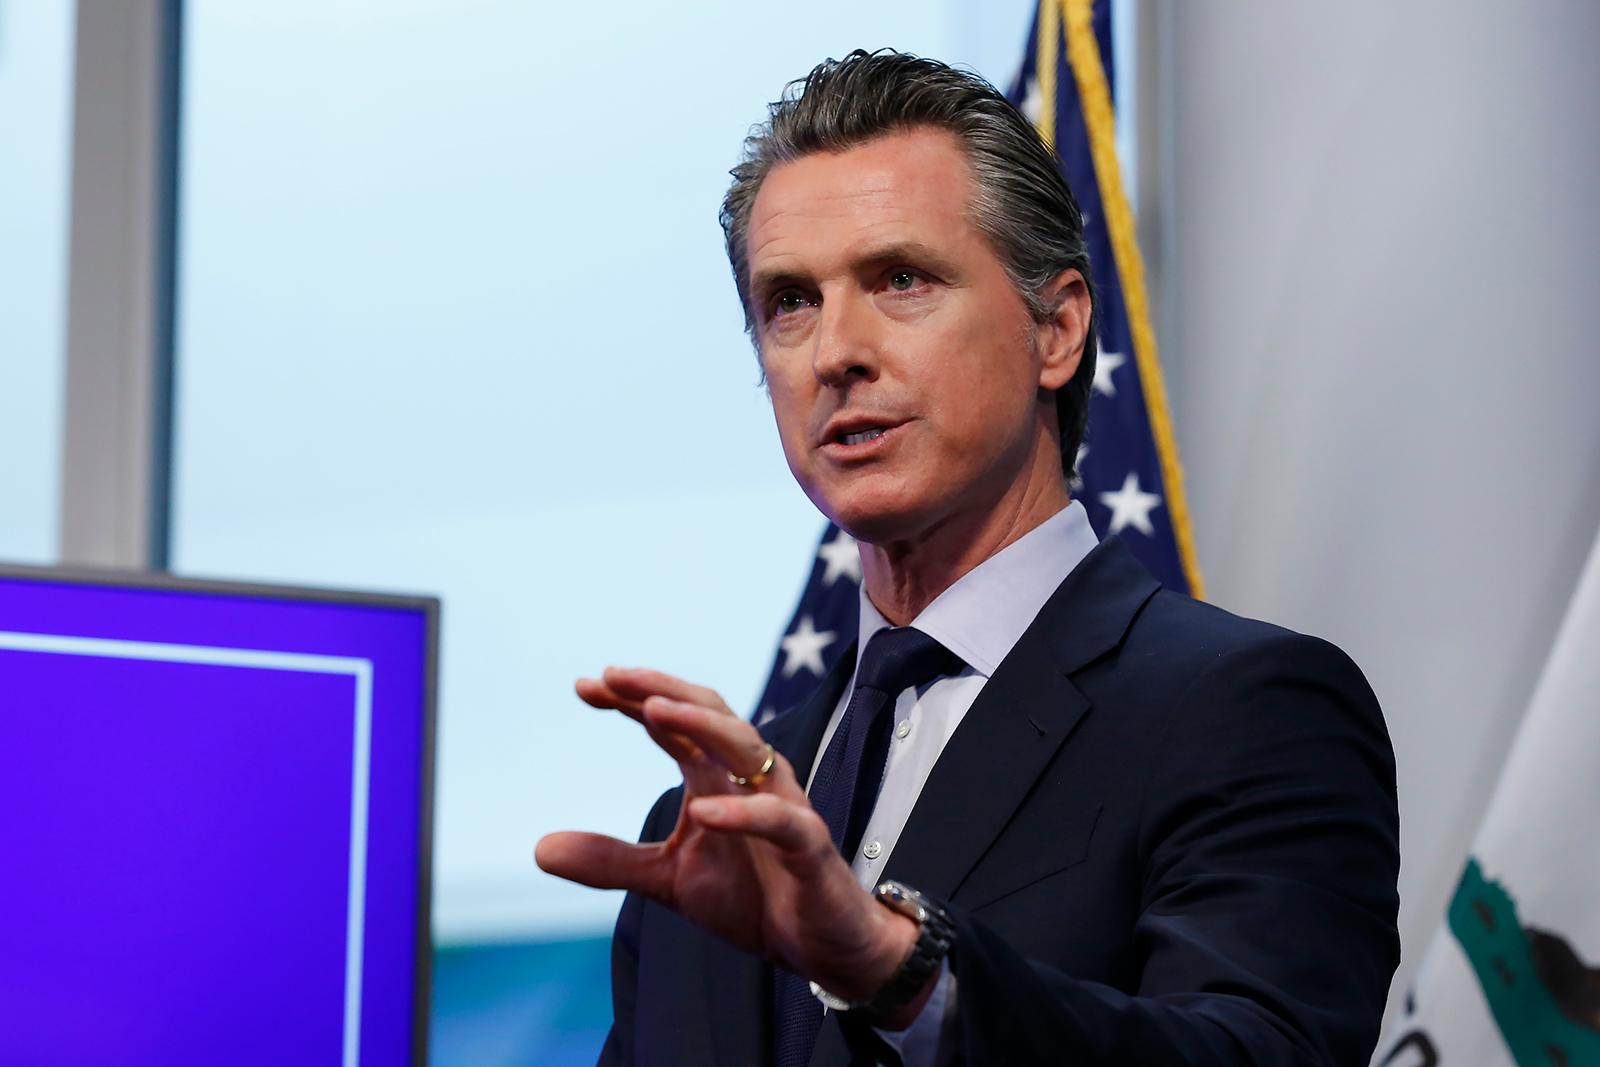 California Gov. Gavin Newsom, speaks during a news conference in Sacramento, California on April 14.